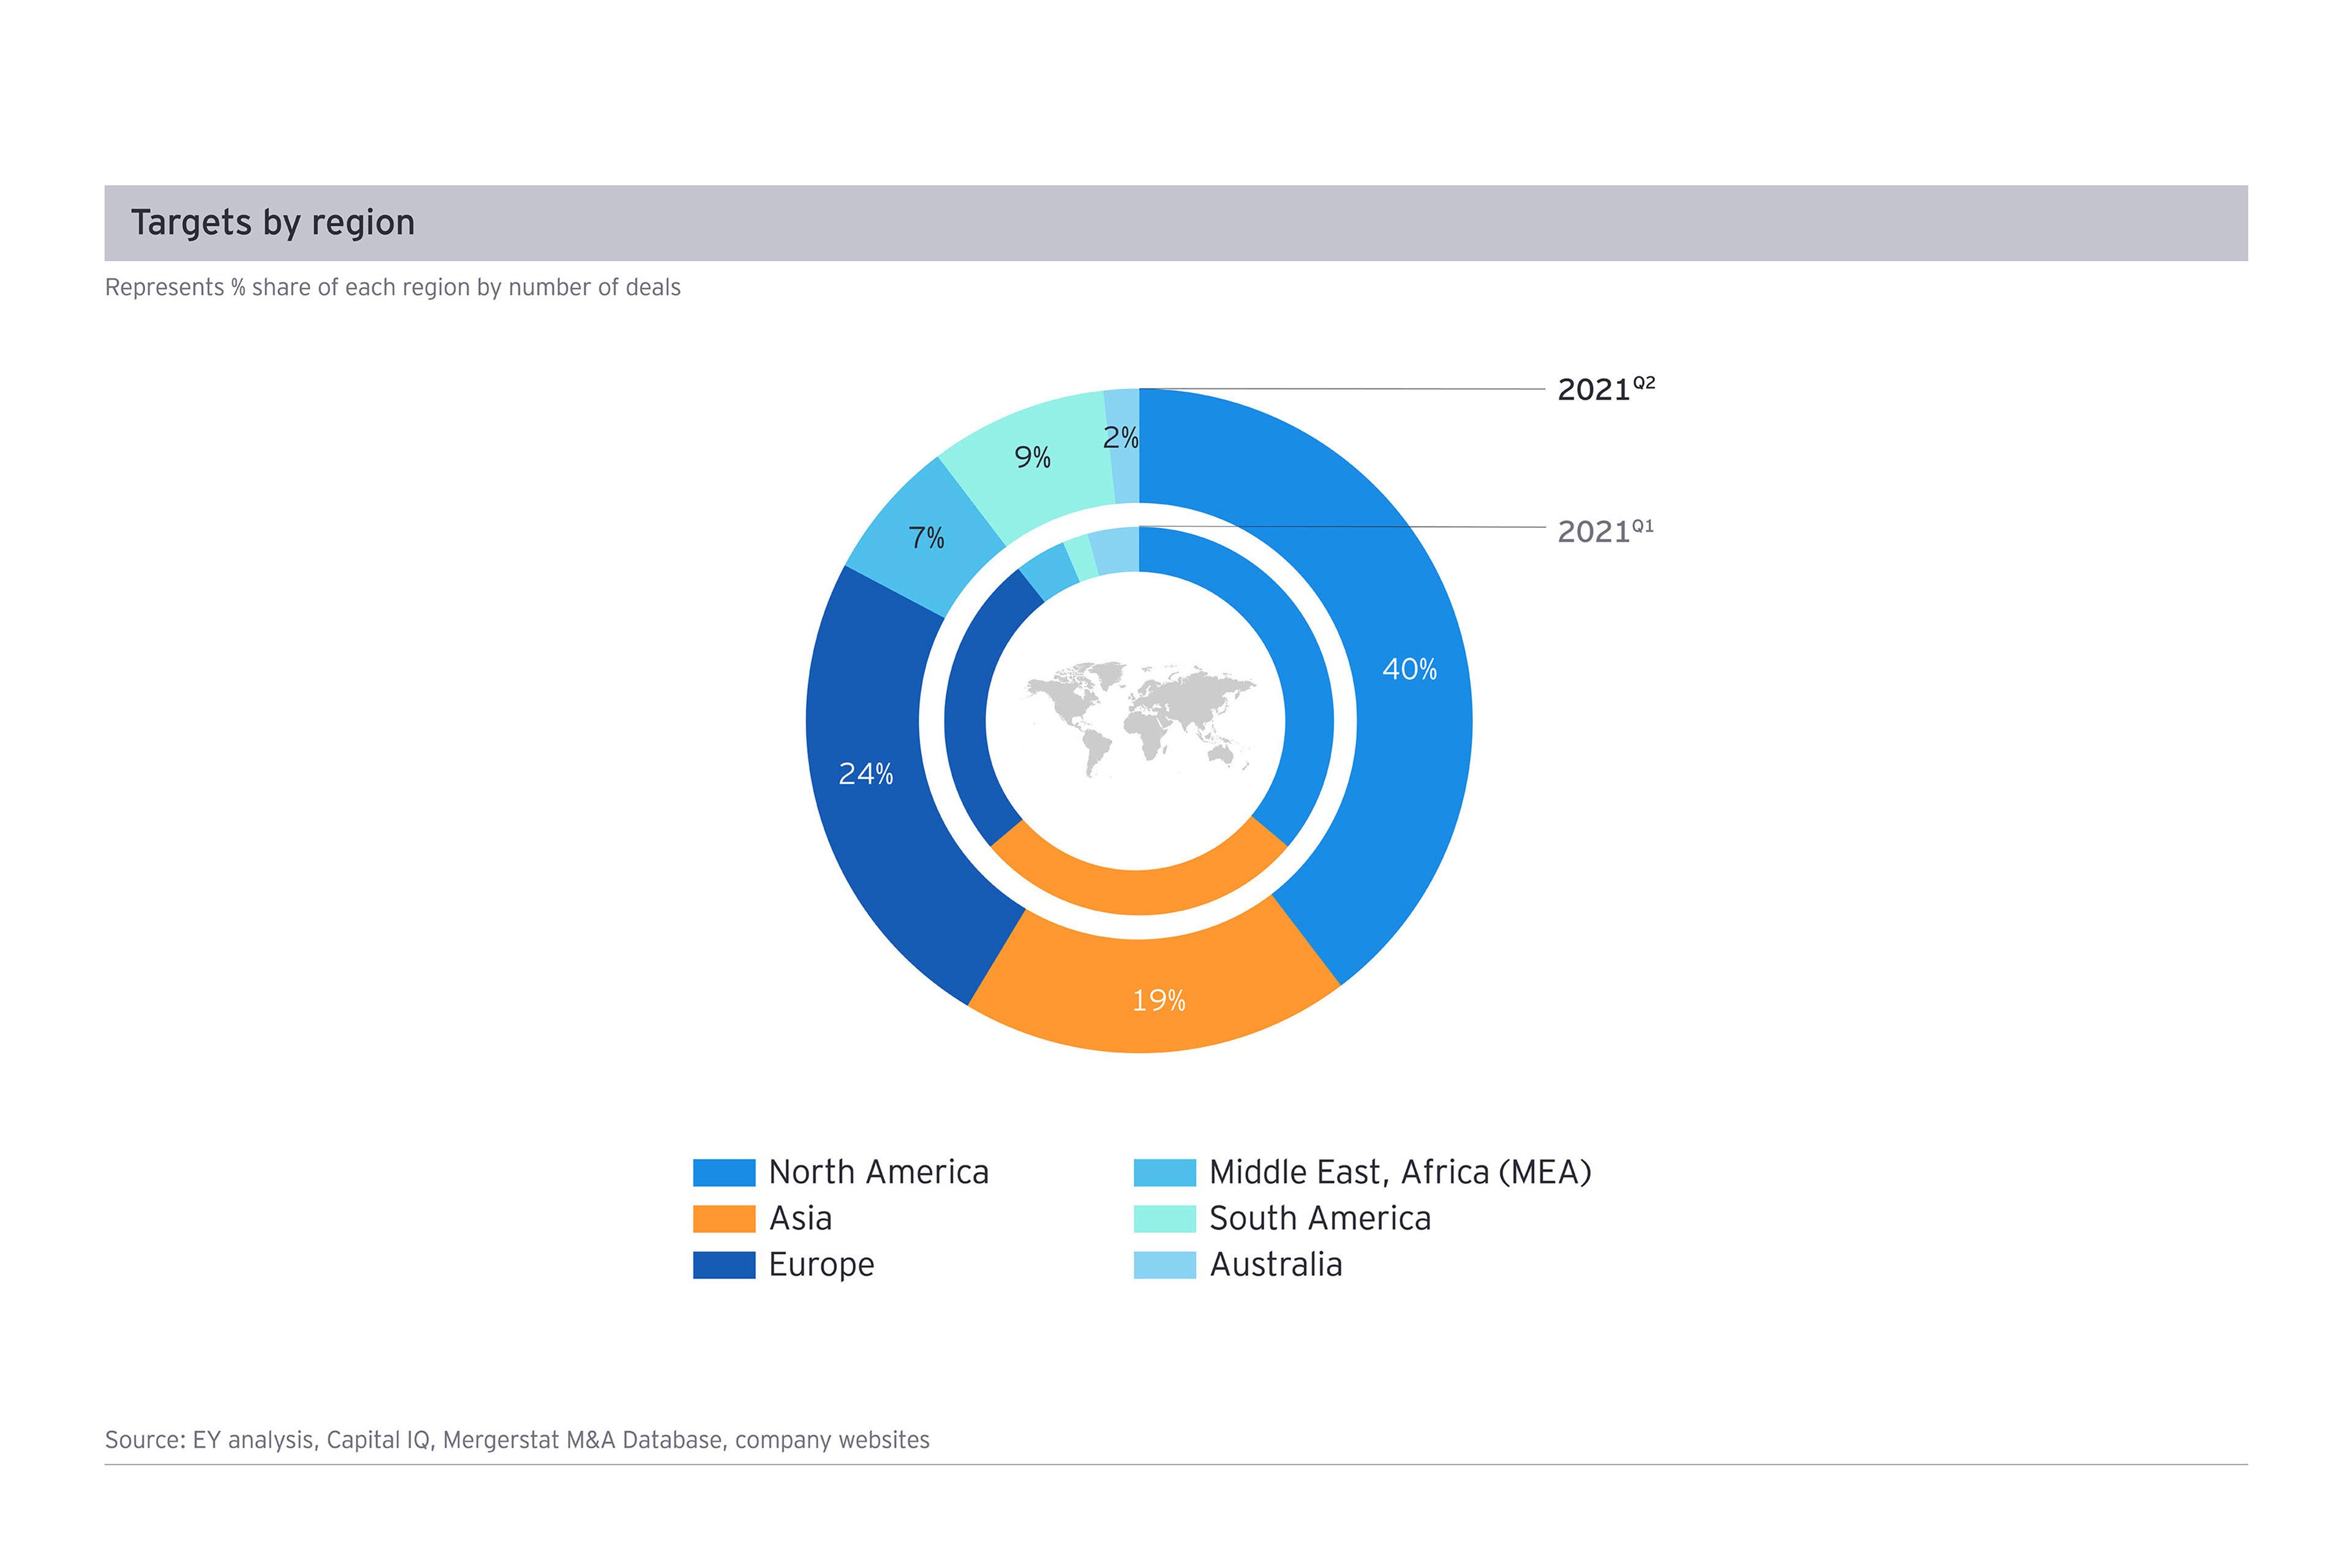 Targets by region Q2 2021